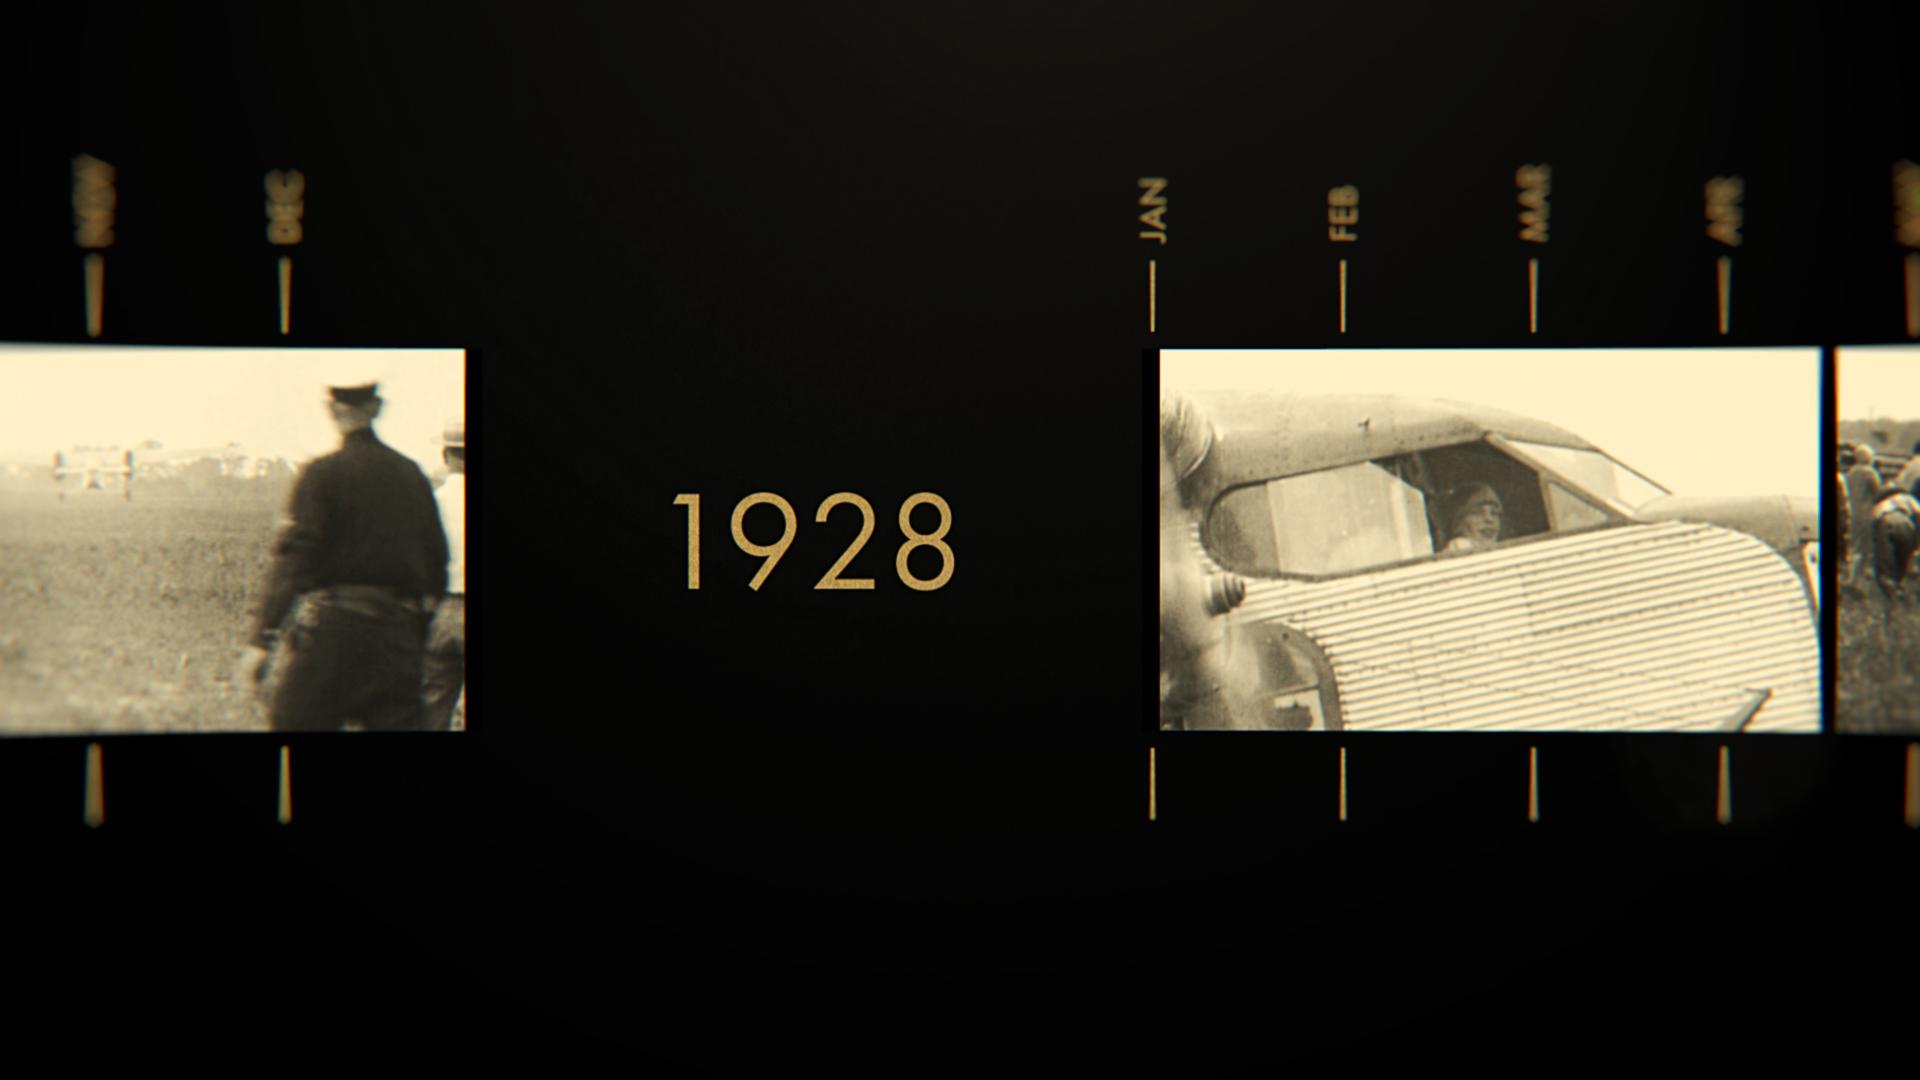 01_EXP_TL_01_1928-1949_FINAL_ProRes4444 (10-16-41-09).jpg